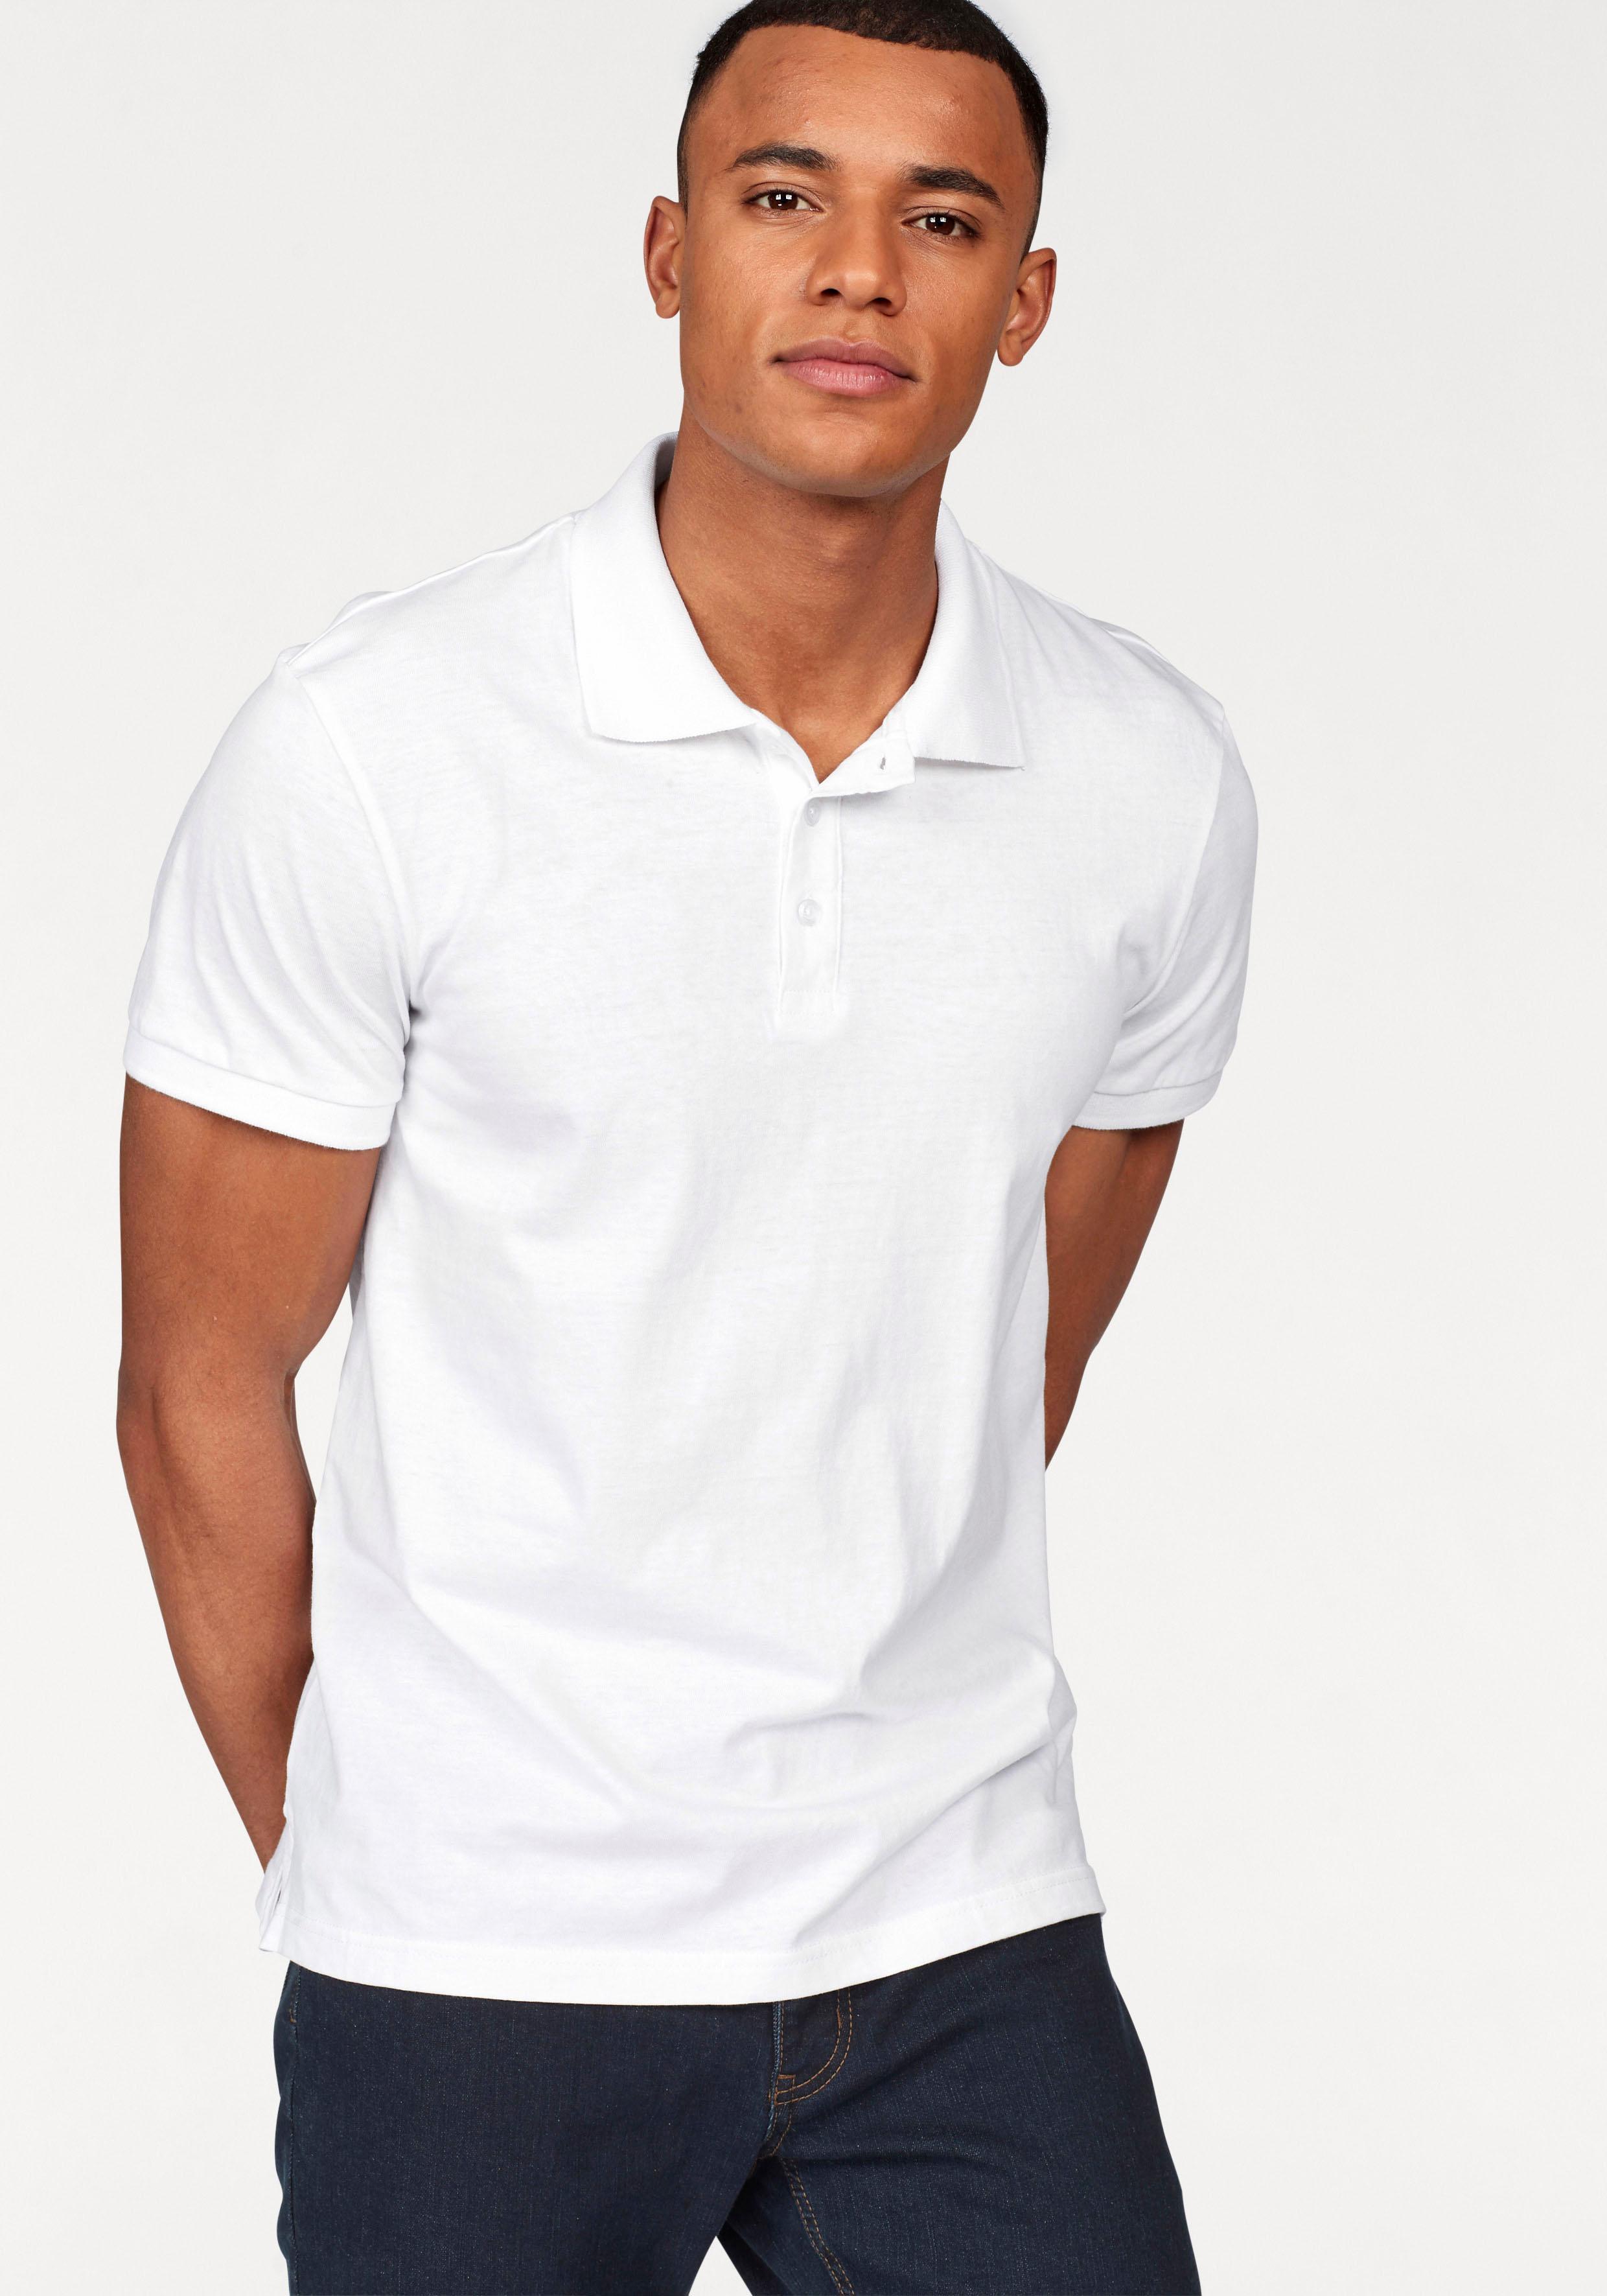 5bae64e2e02223 John Devin Poloshirt kaufen » BAUR